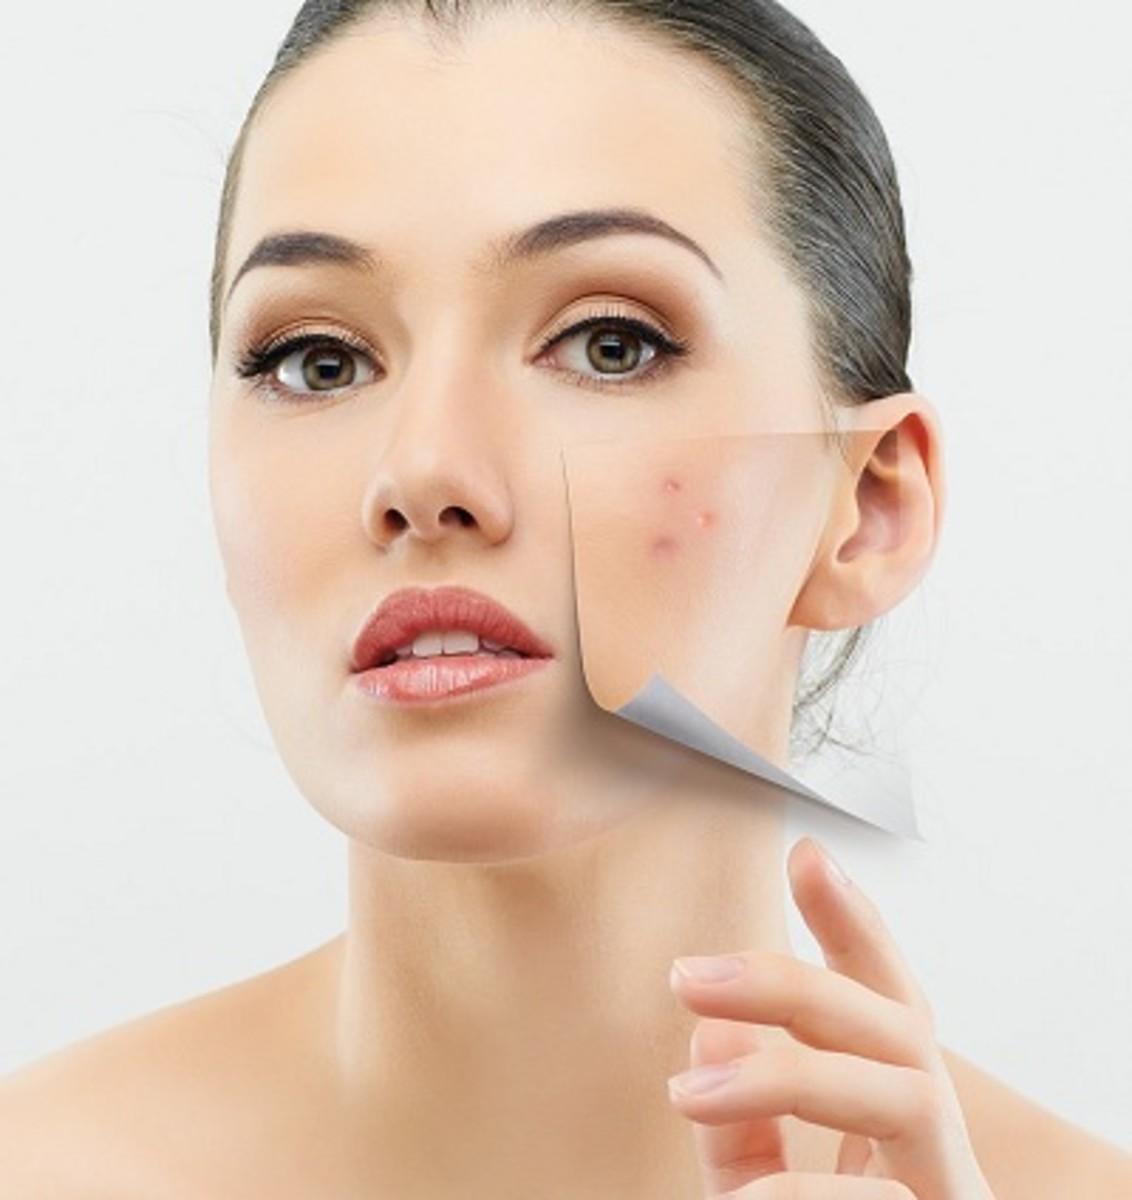 Clear skin without acne, after using Apple Cider Vinegar Toner